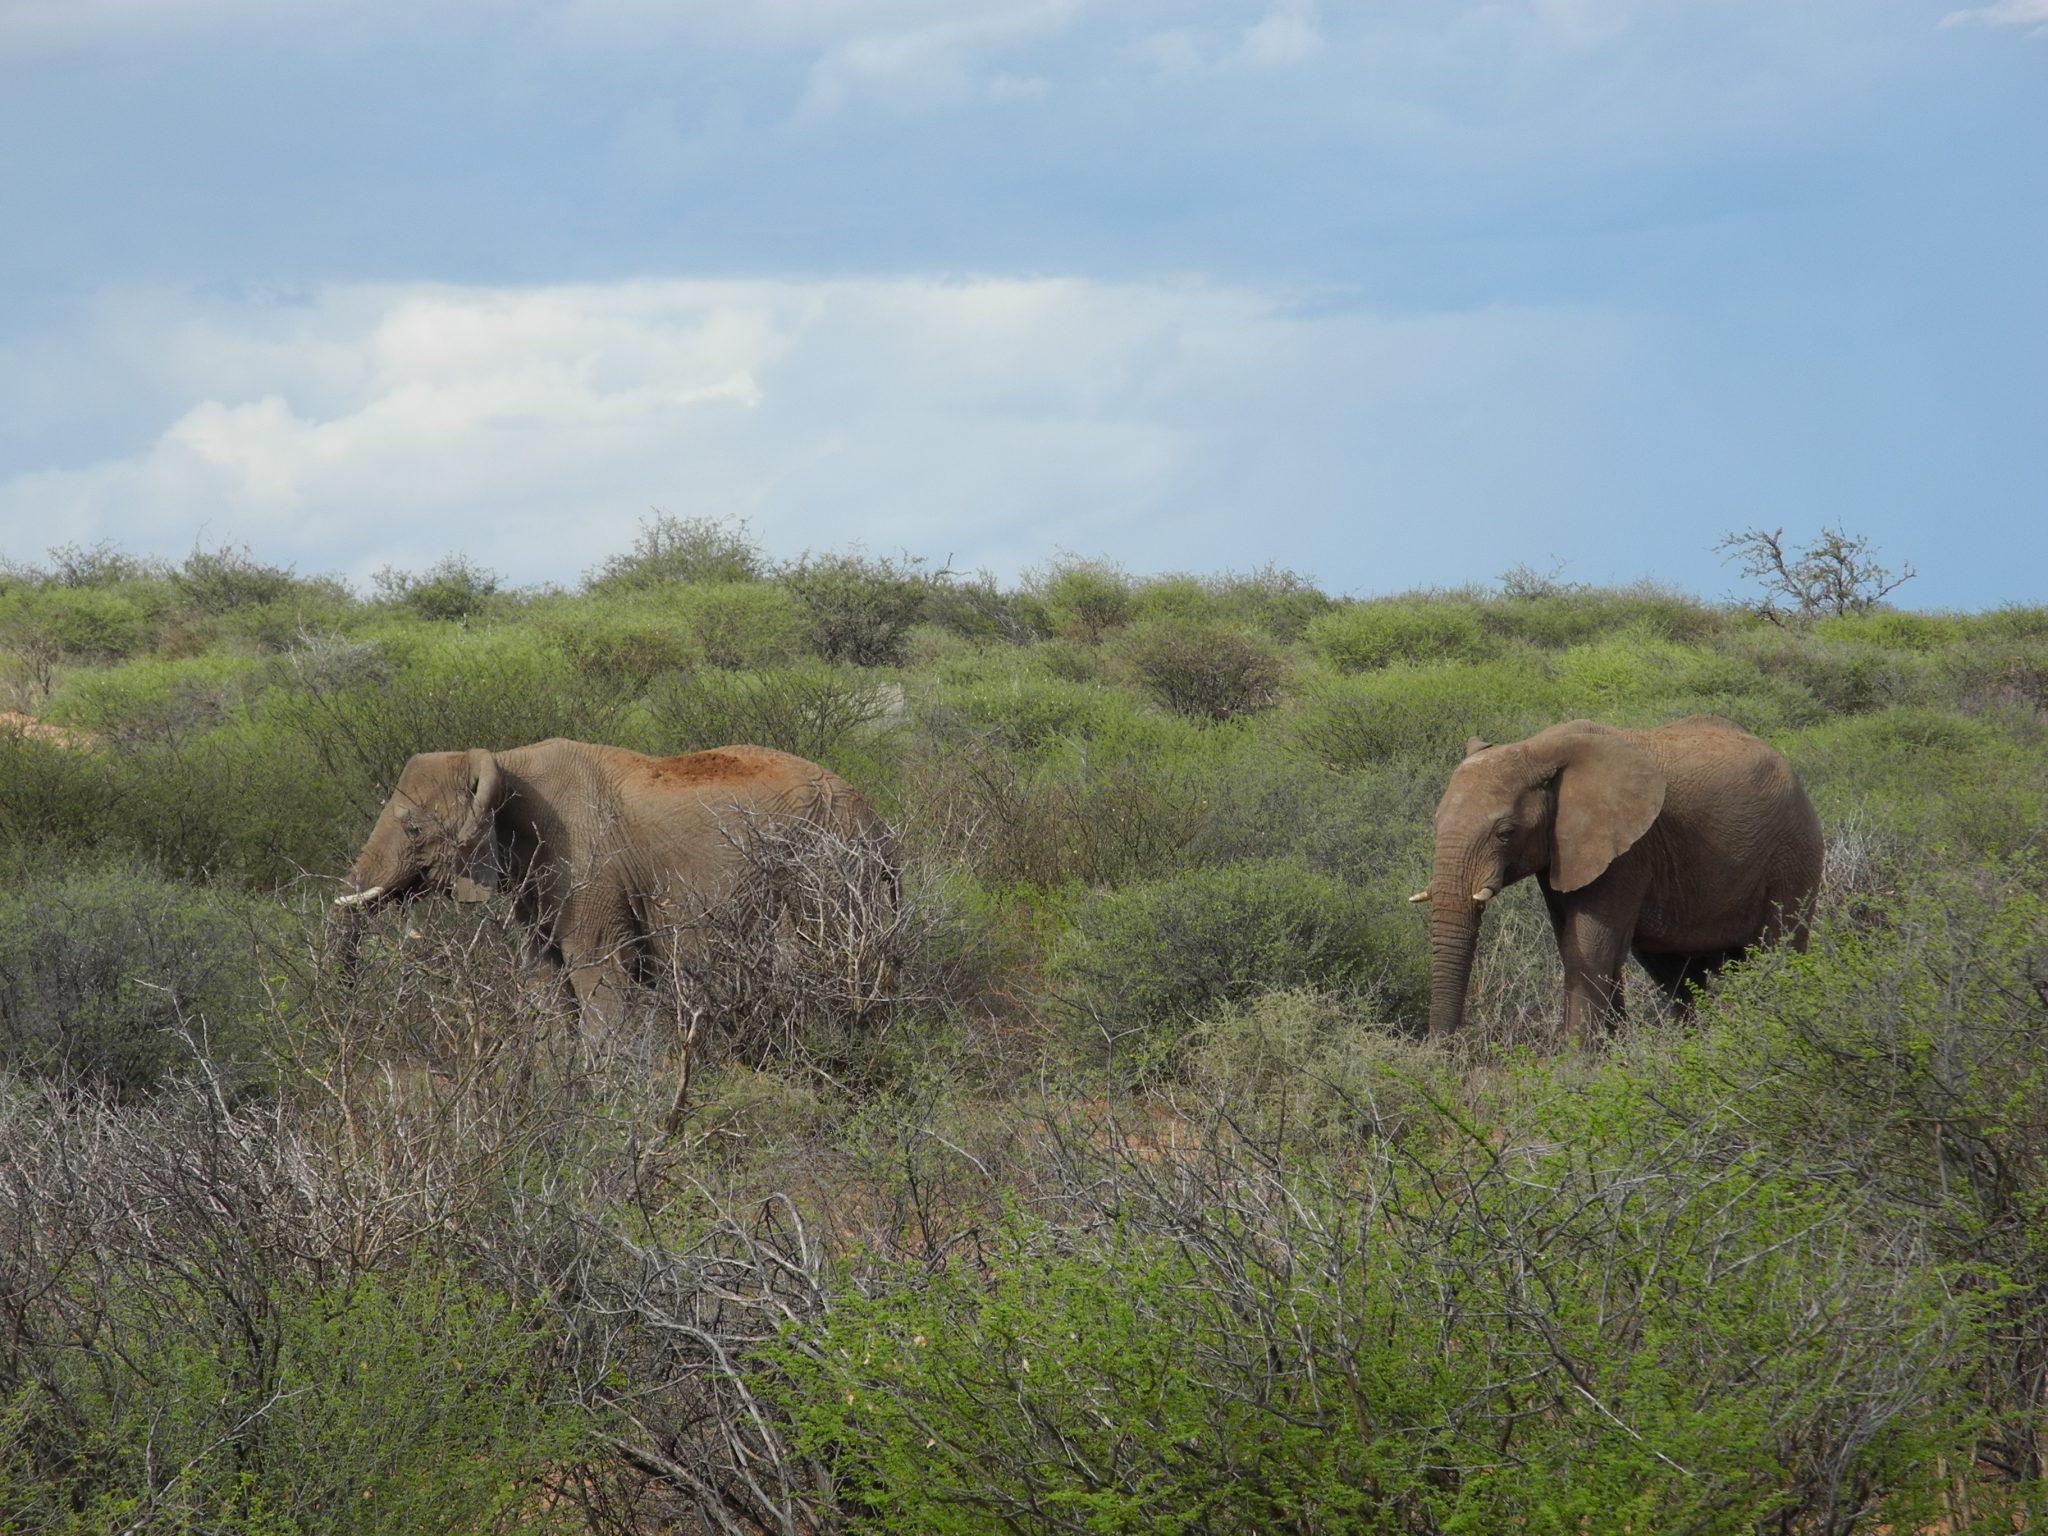 Uitgelezene Namibia - Okambara Elephant Lodge - HANNS unterwegs VG-37